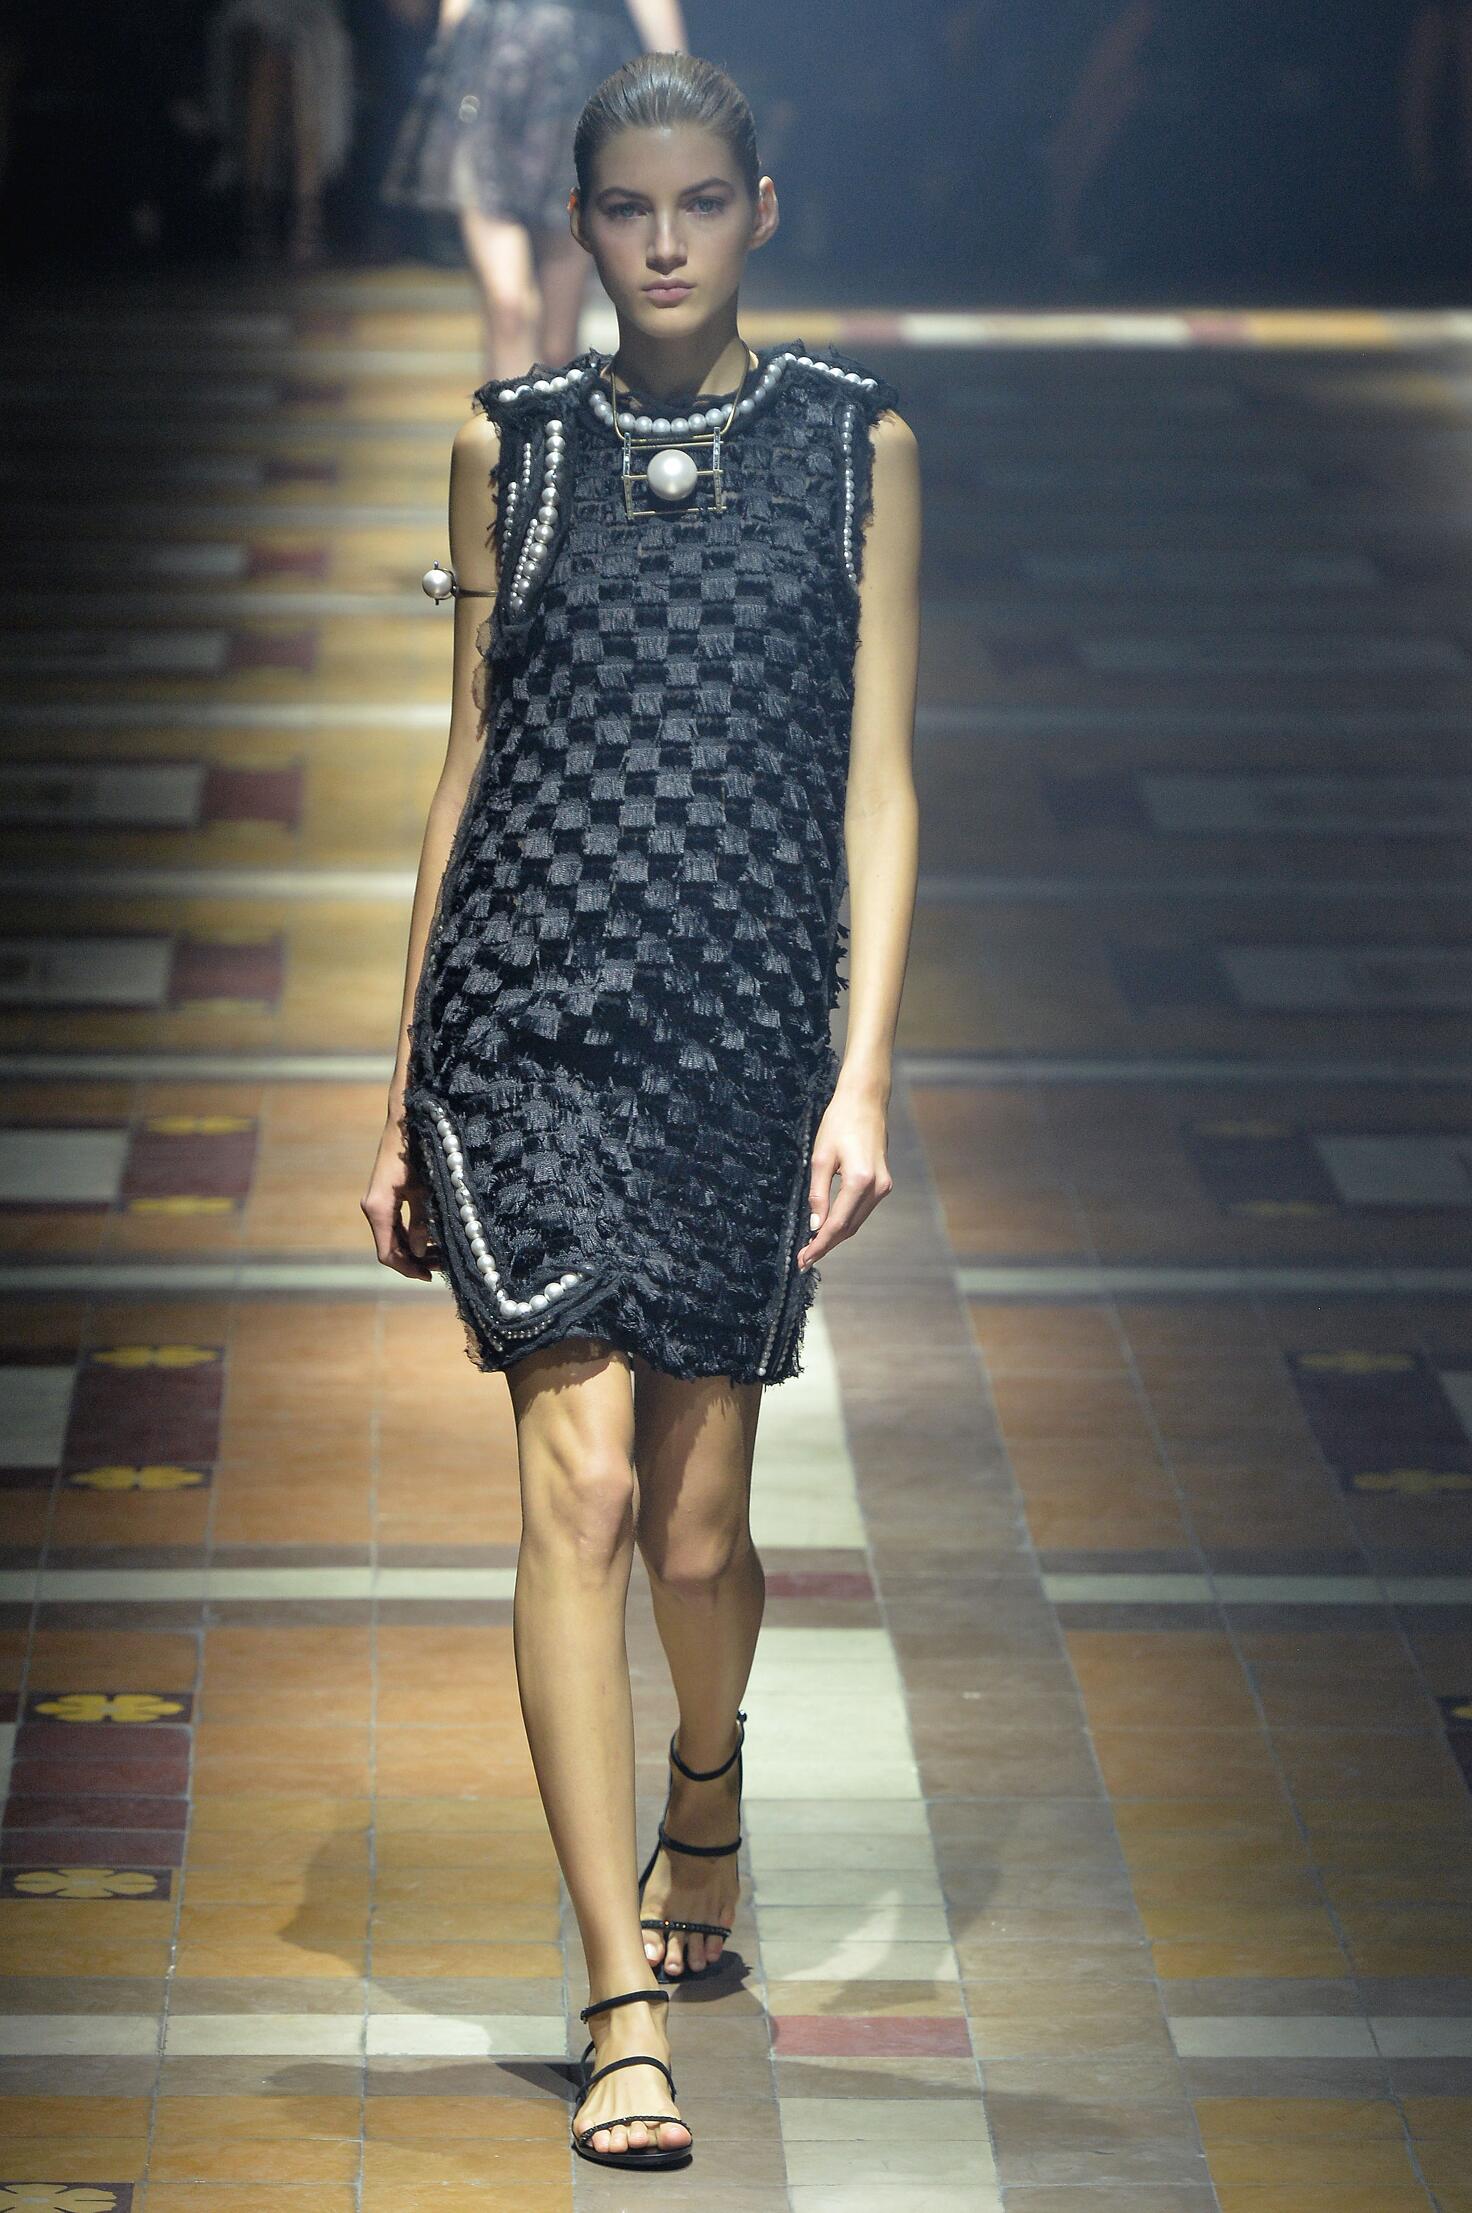 2015 Catwalk Lanvin Woman Fashion Show Summer